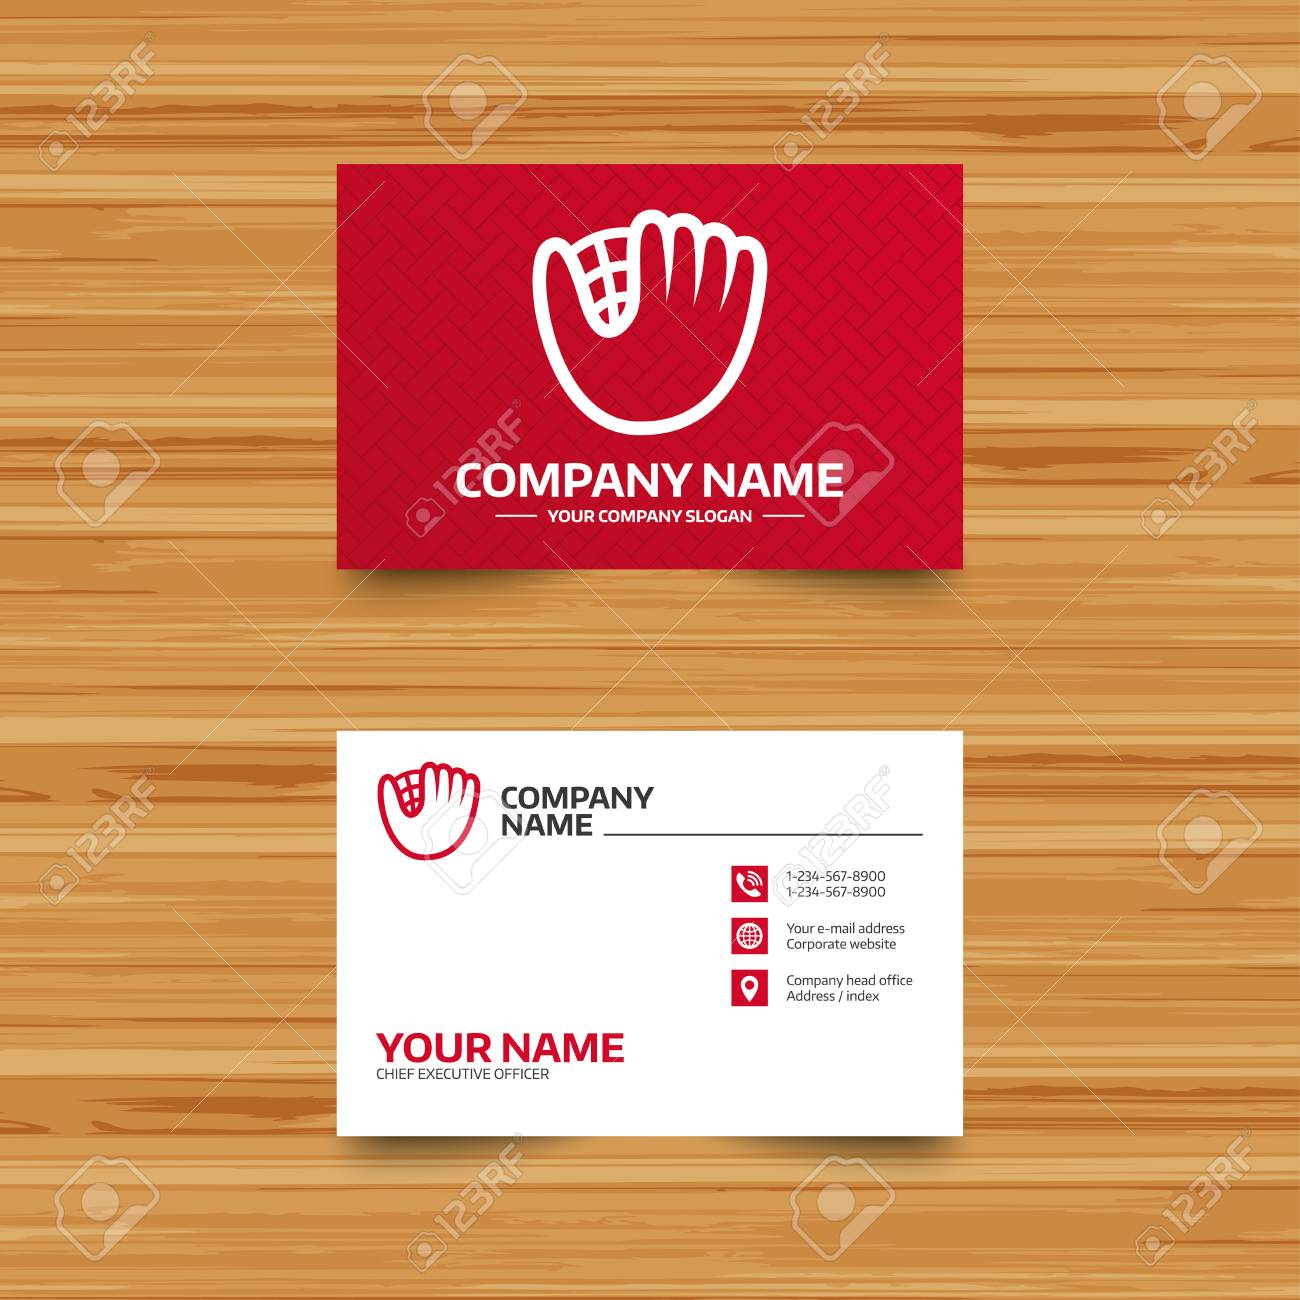 Business card template baseball glove or mitt sign icon sport business card template baseball glove or mitt sign icon sport symbol phone colourmoves Choice Image